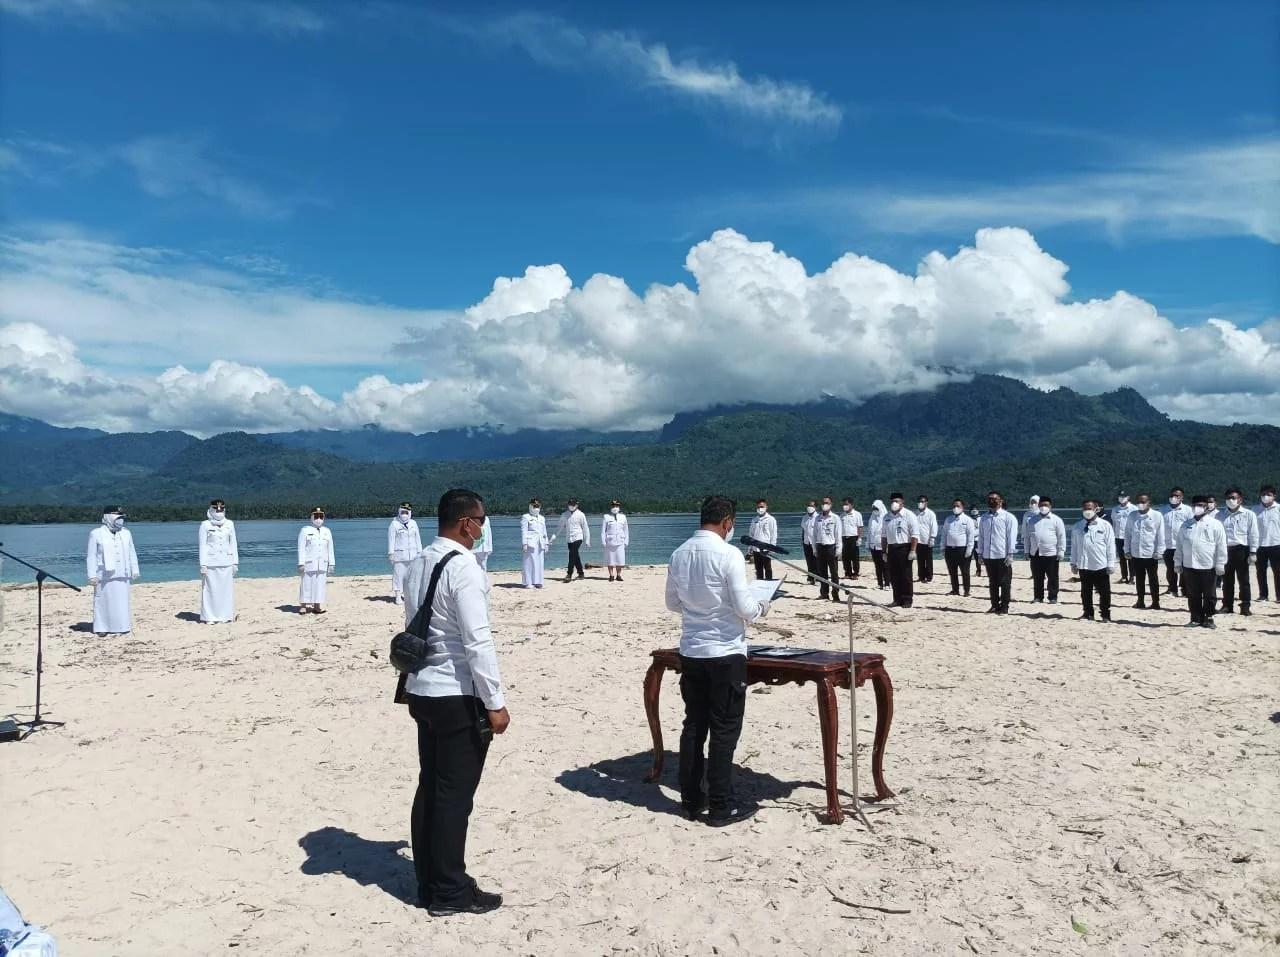 Boltim Bersinar di Pulau Nanas, Bupati Sam Sachrul Mamonto Lantik Jabatan Eselon II,III,IV